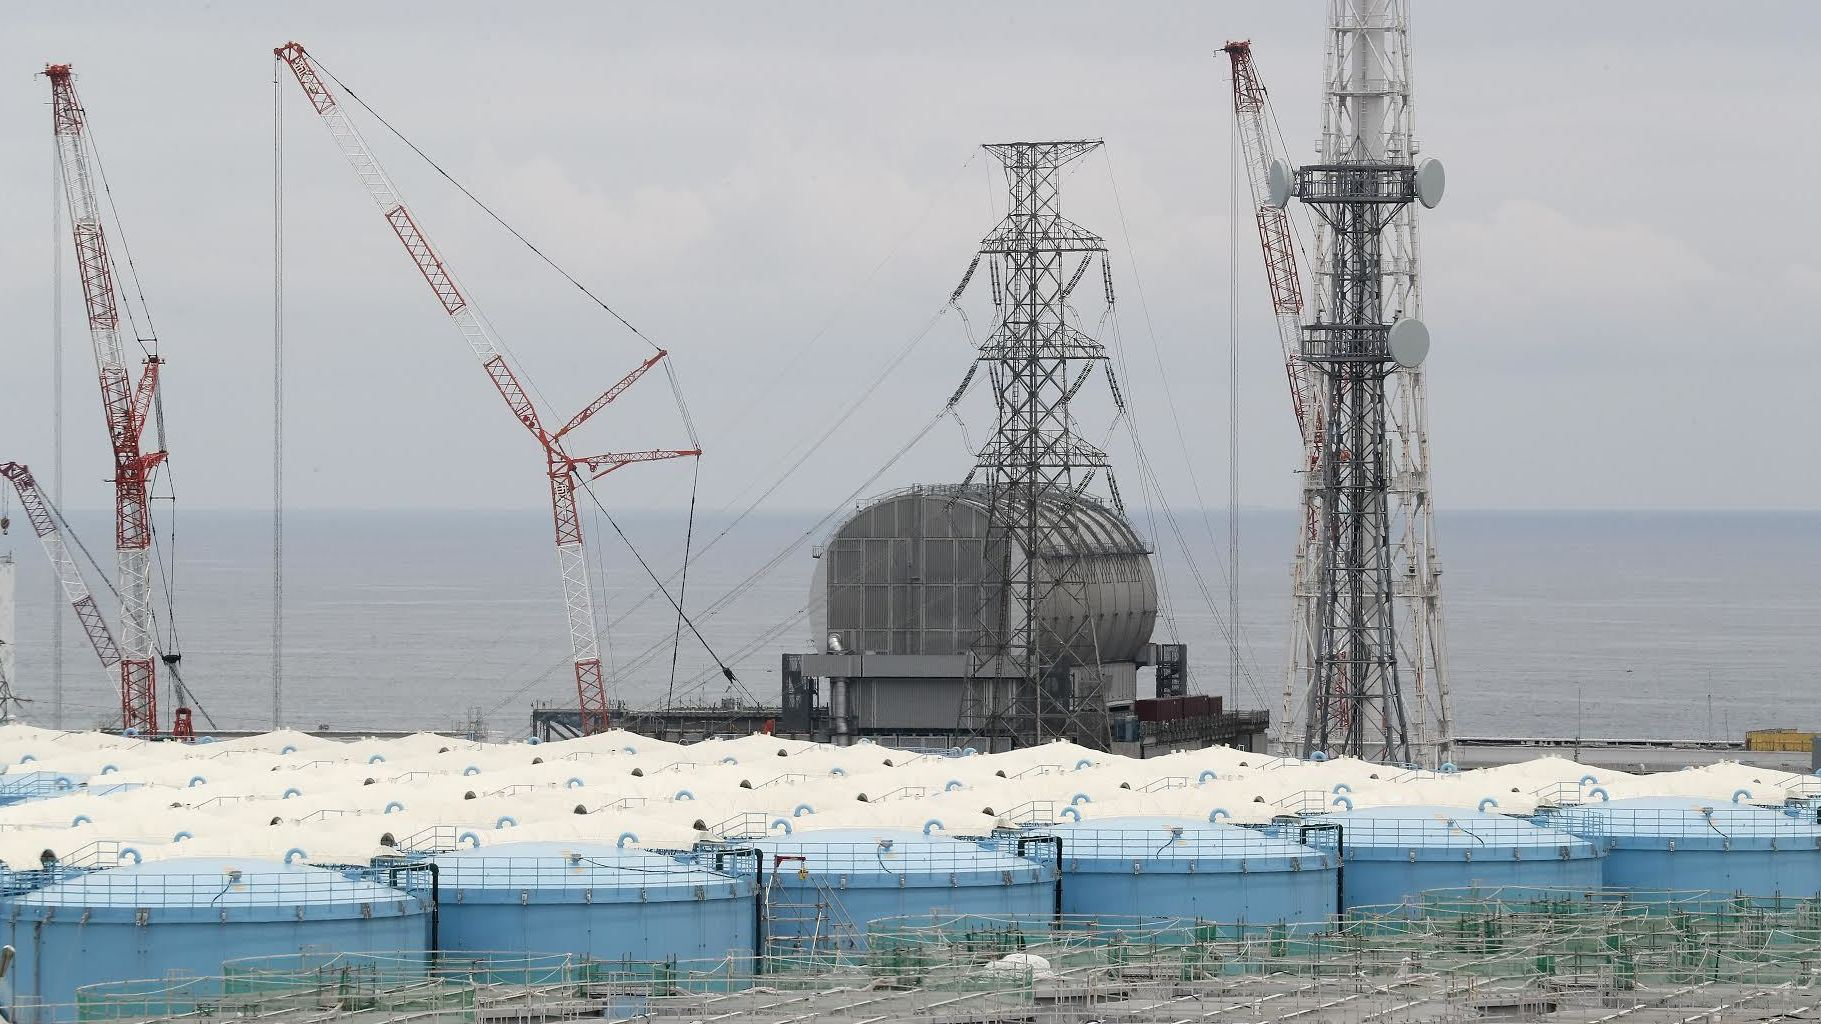 Executives In Fukushima Nuclear Disaster Deserve 5-Year Prison Terms, Prosecutors Say